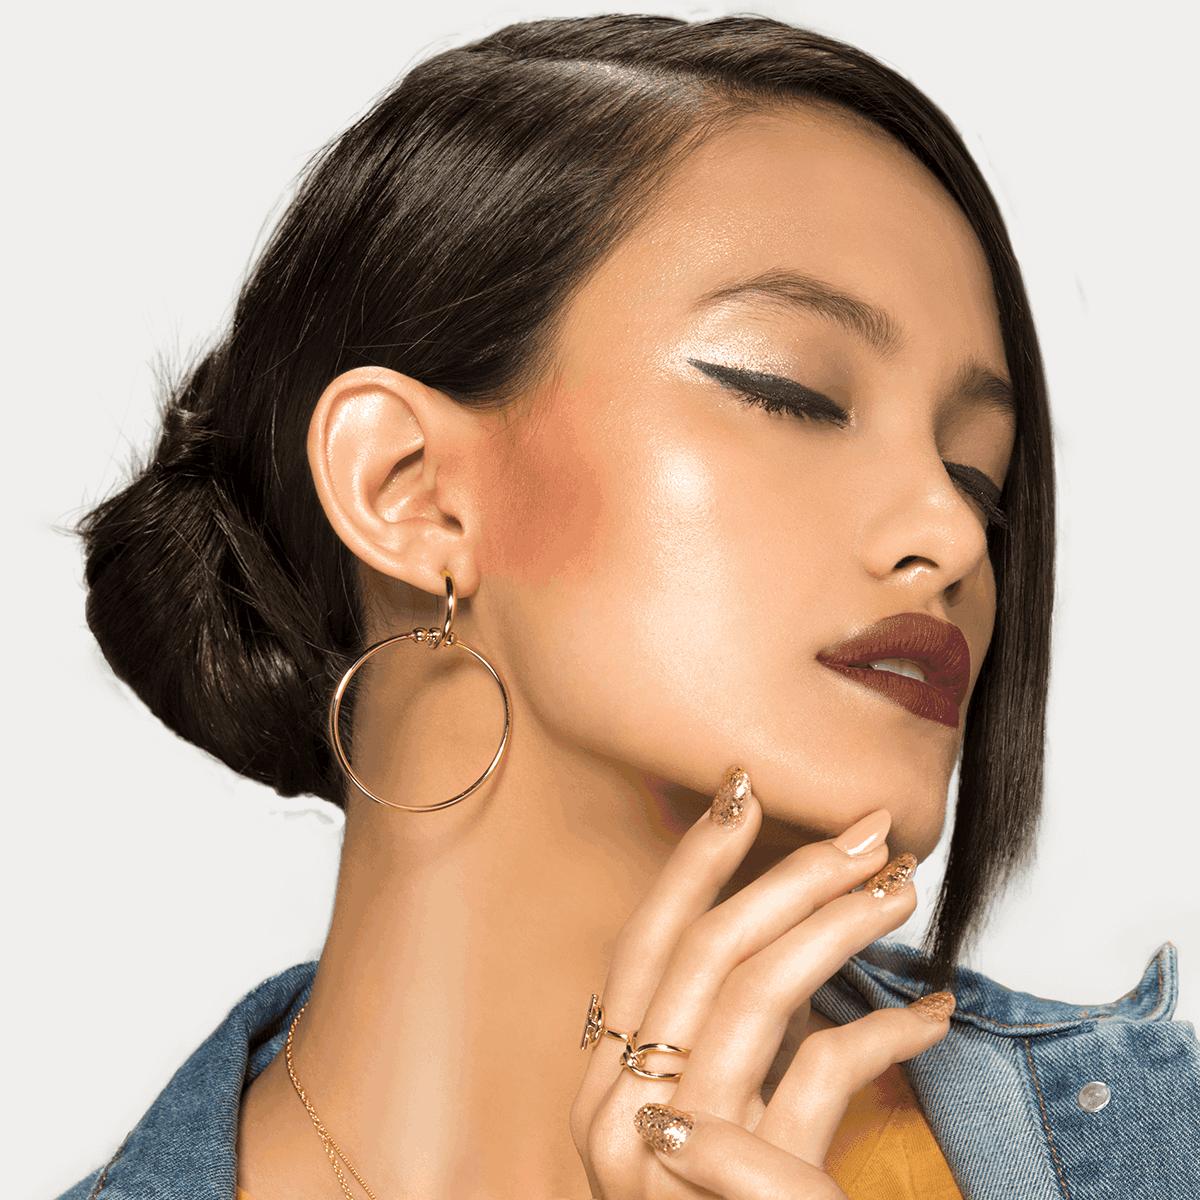 Diva Makeup Look - Dark Lips & Sharp Eyeliner